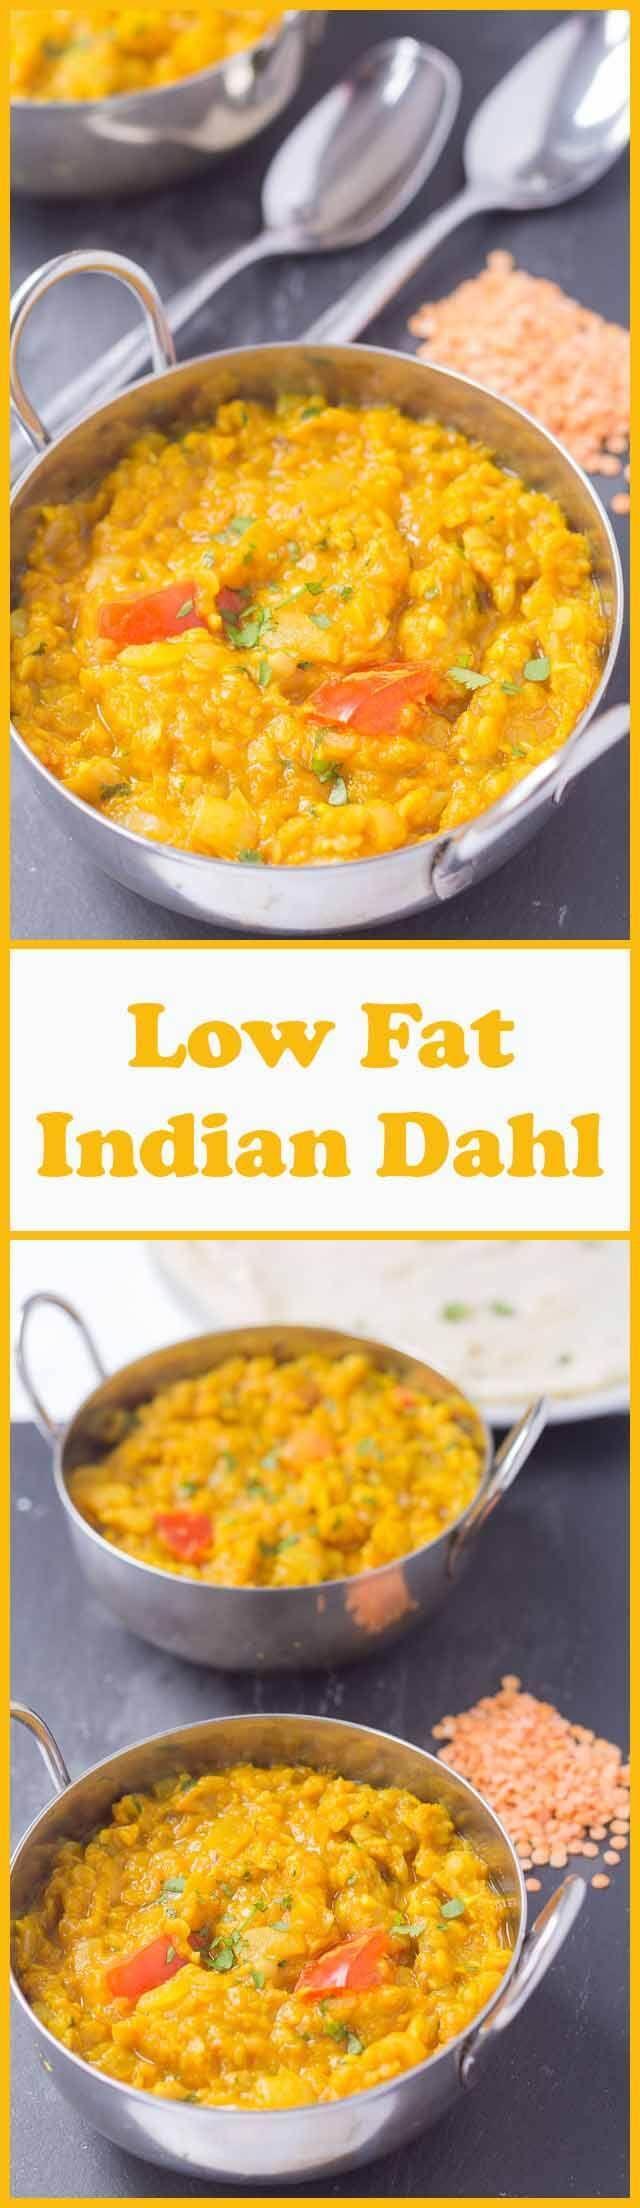 Low Fat Indian Dahl Recipe Indian Recipes Food